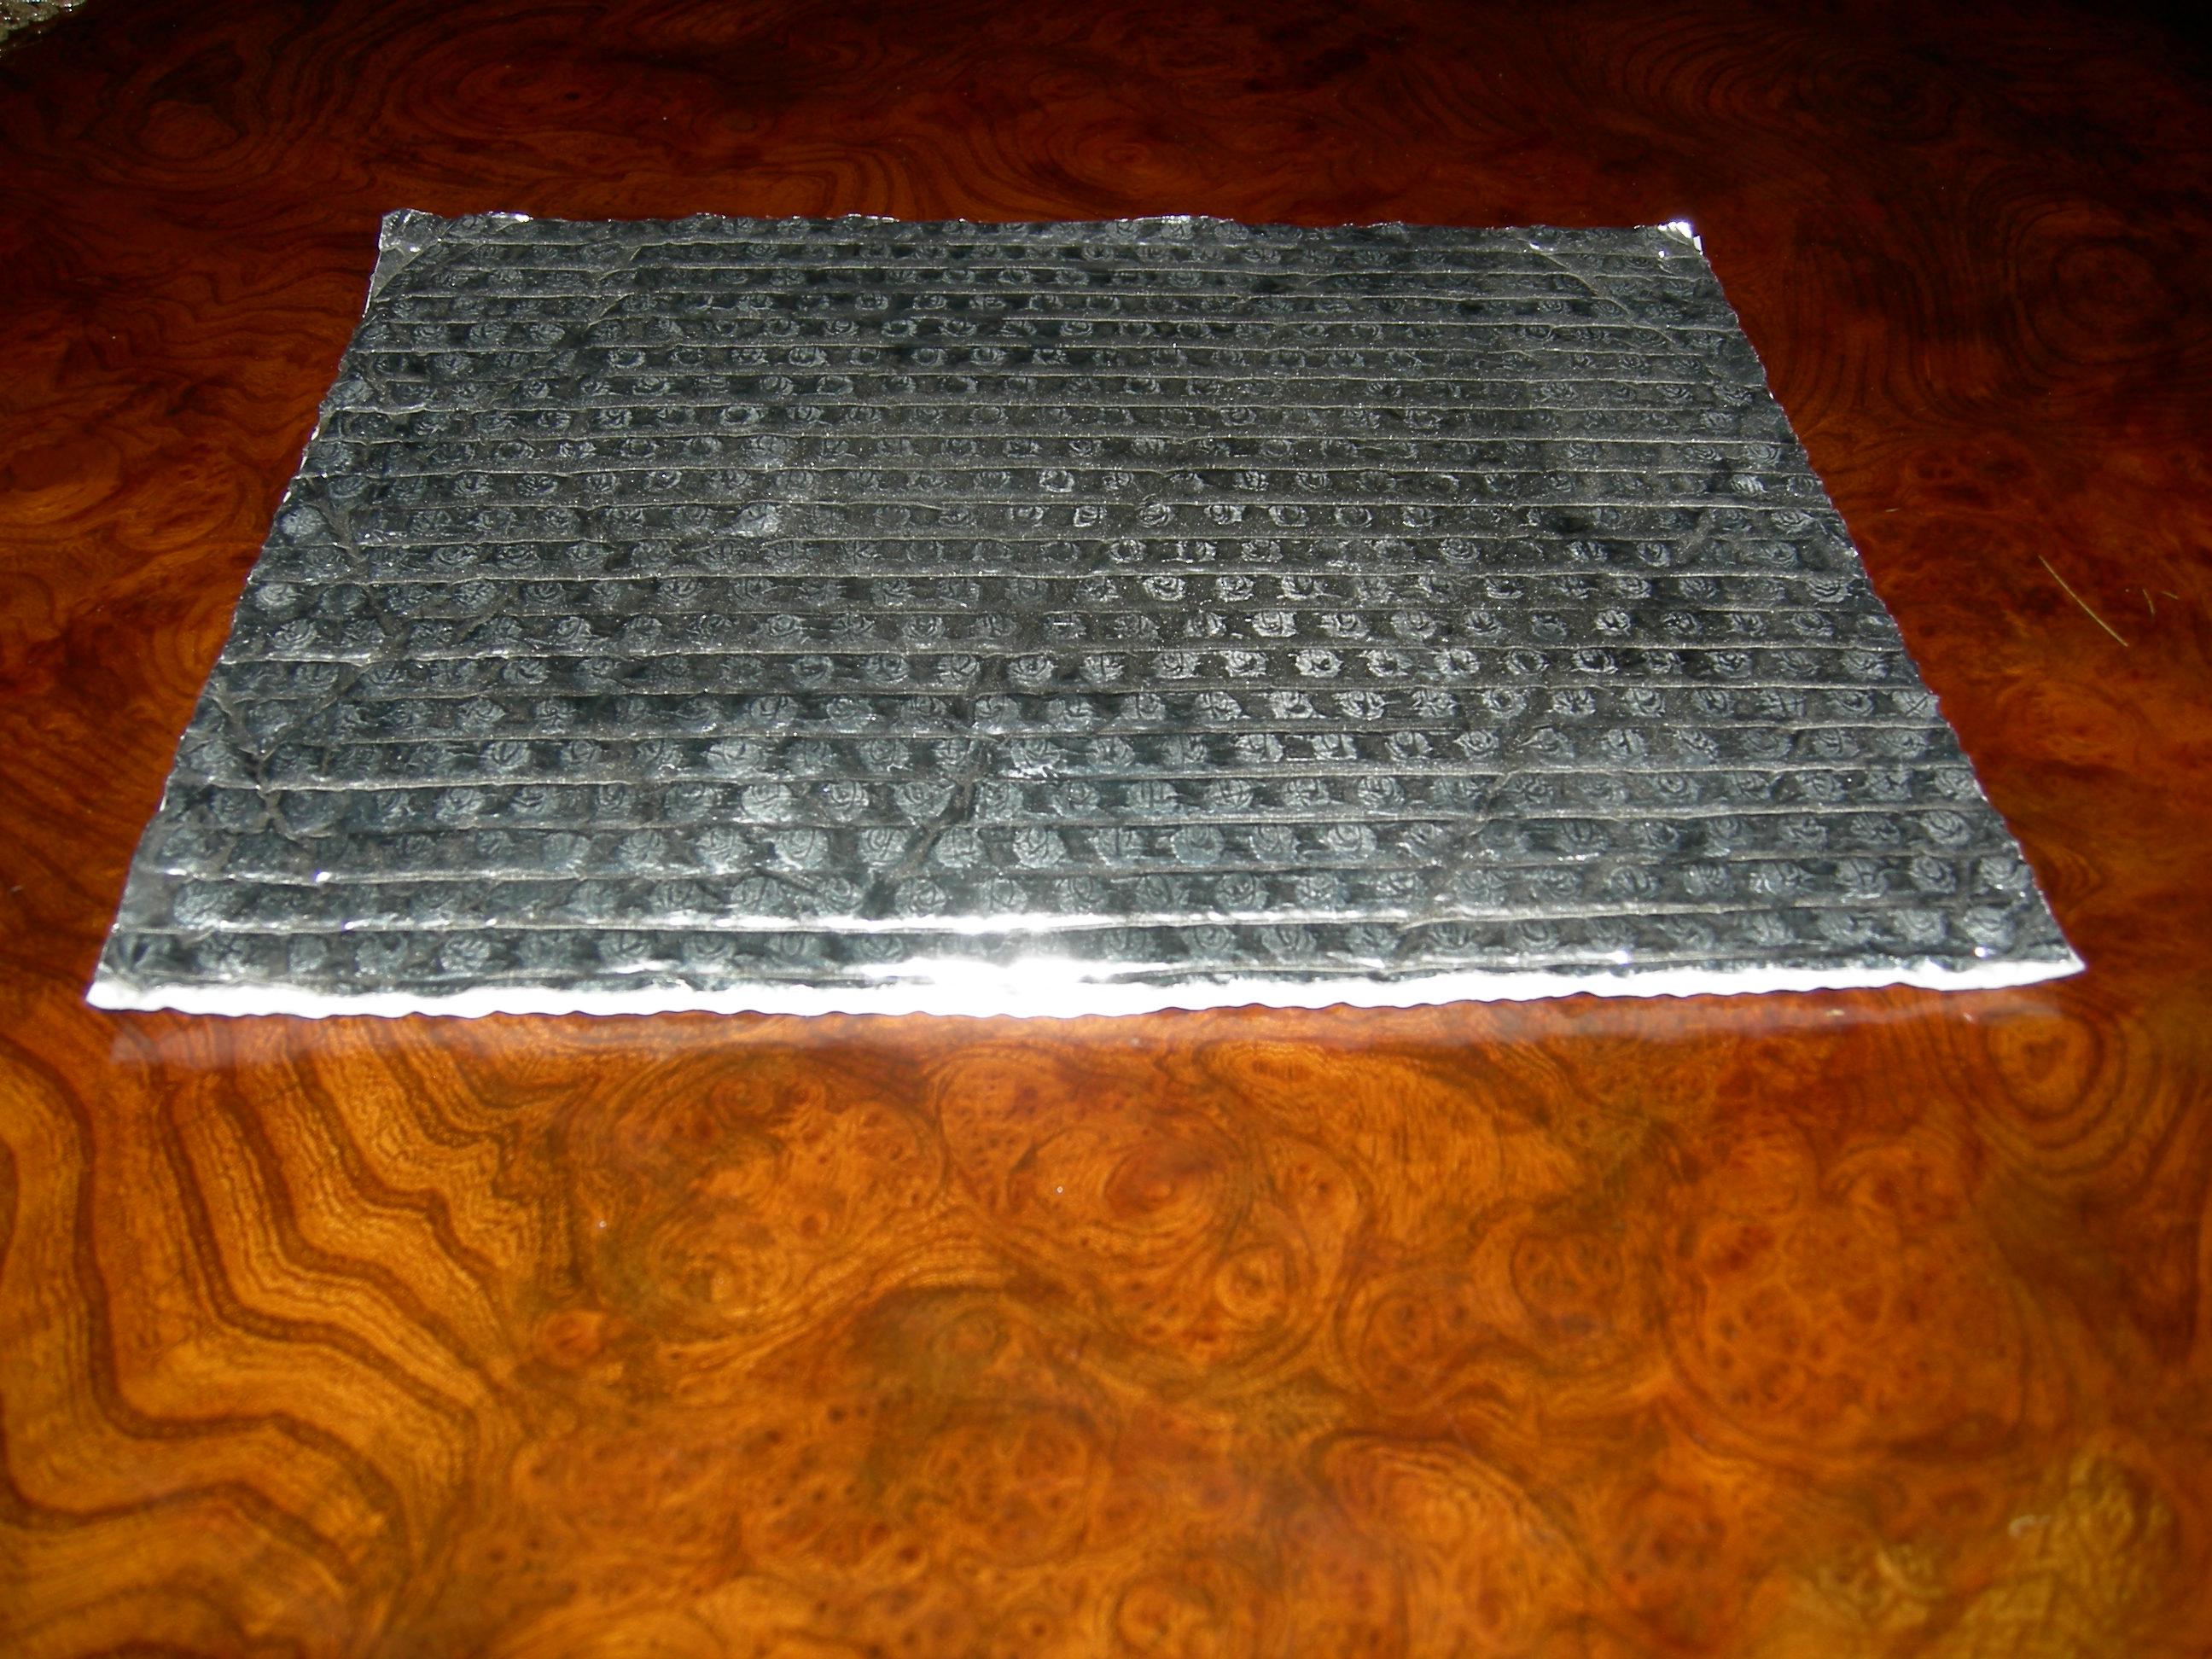 Reflectex Reflective foil Insulation